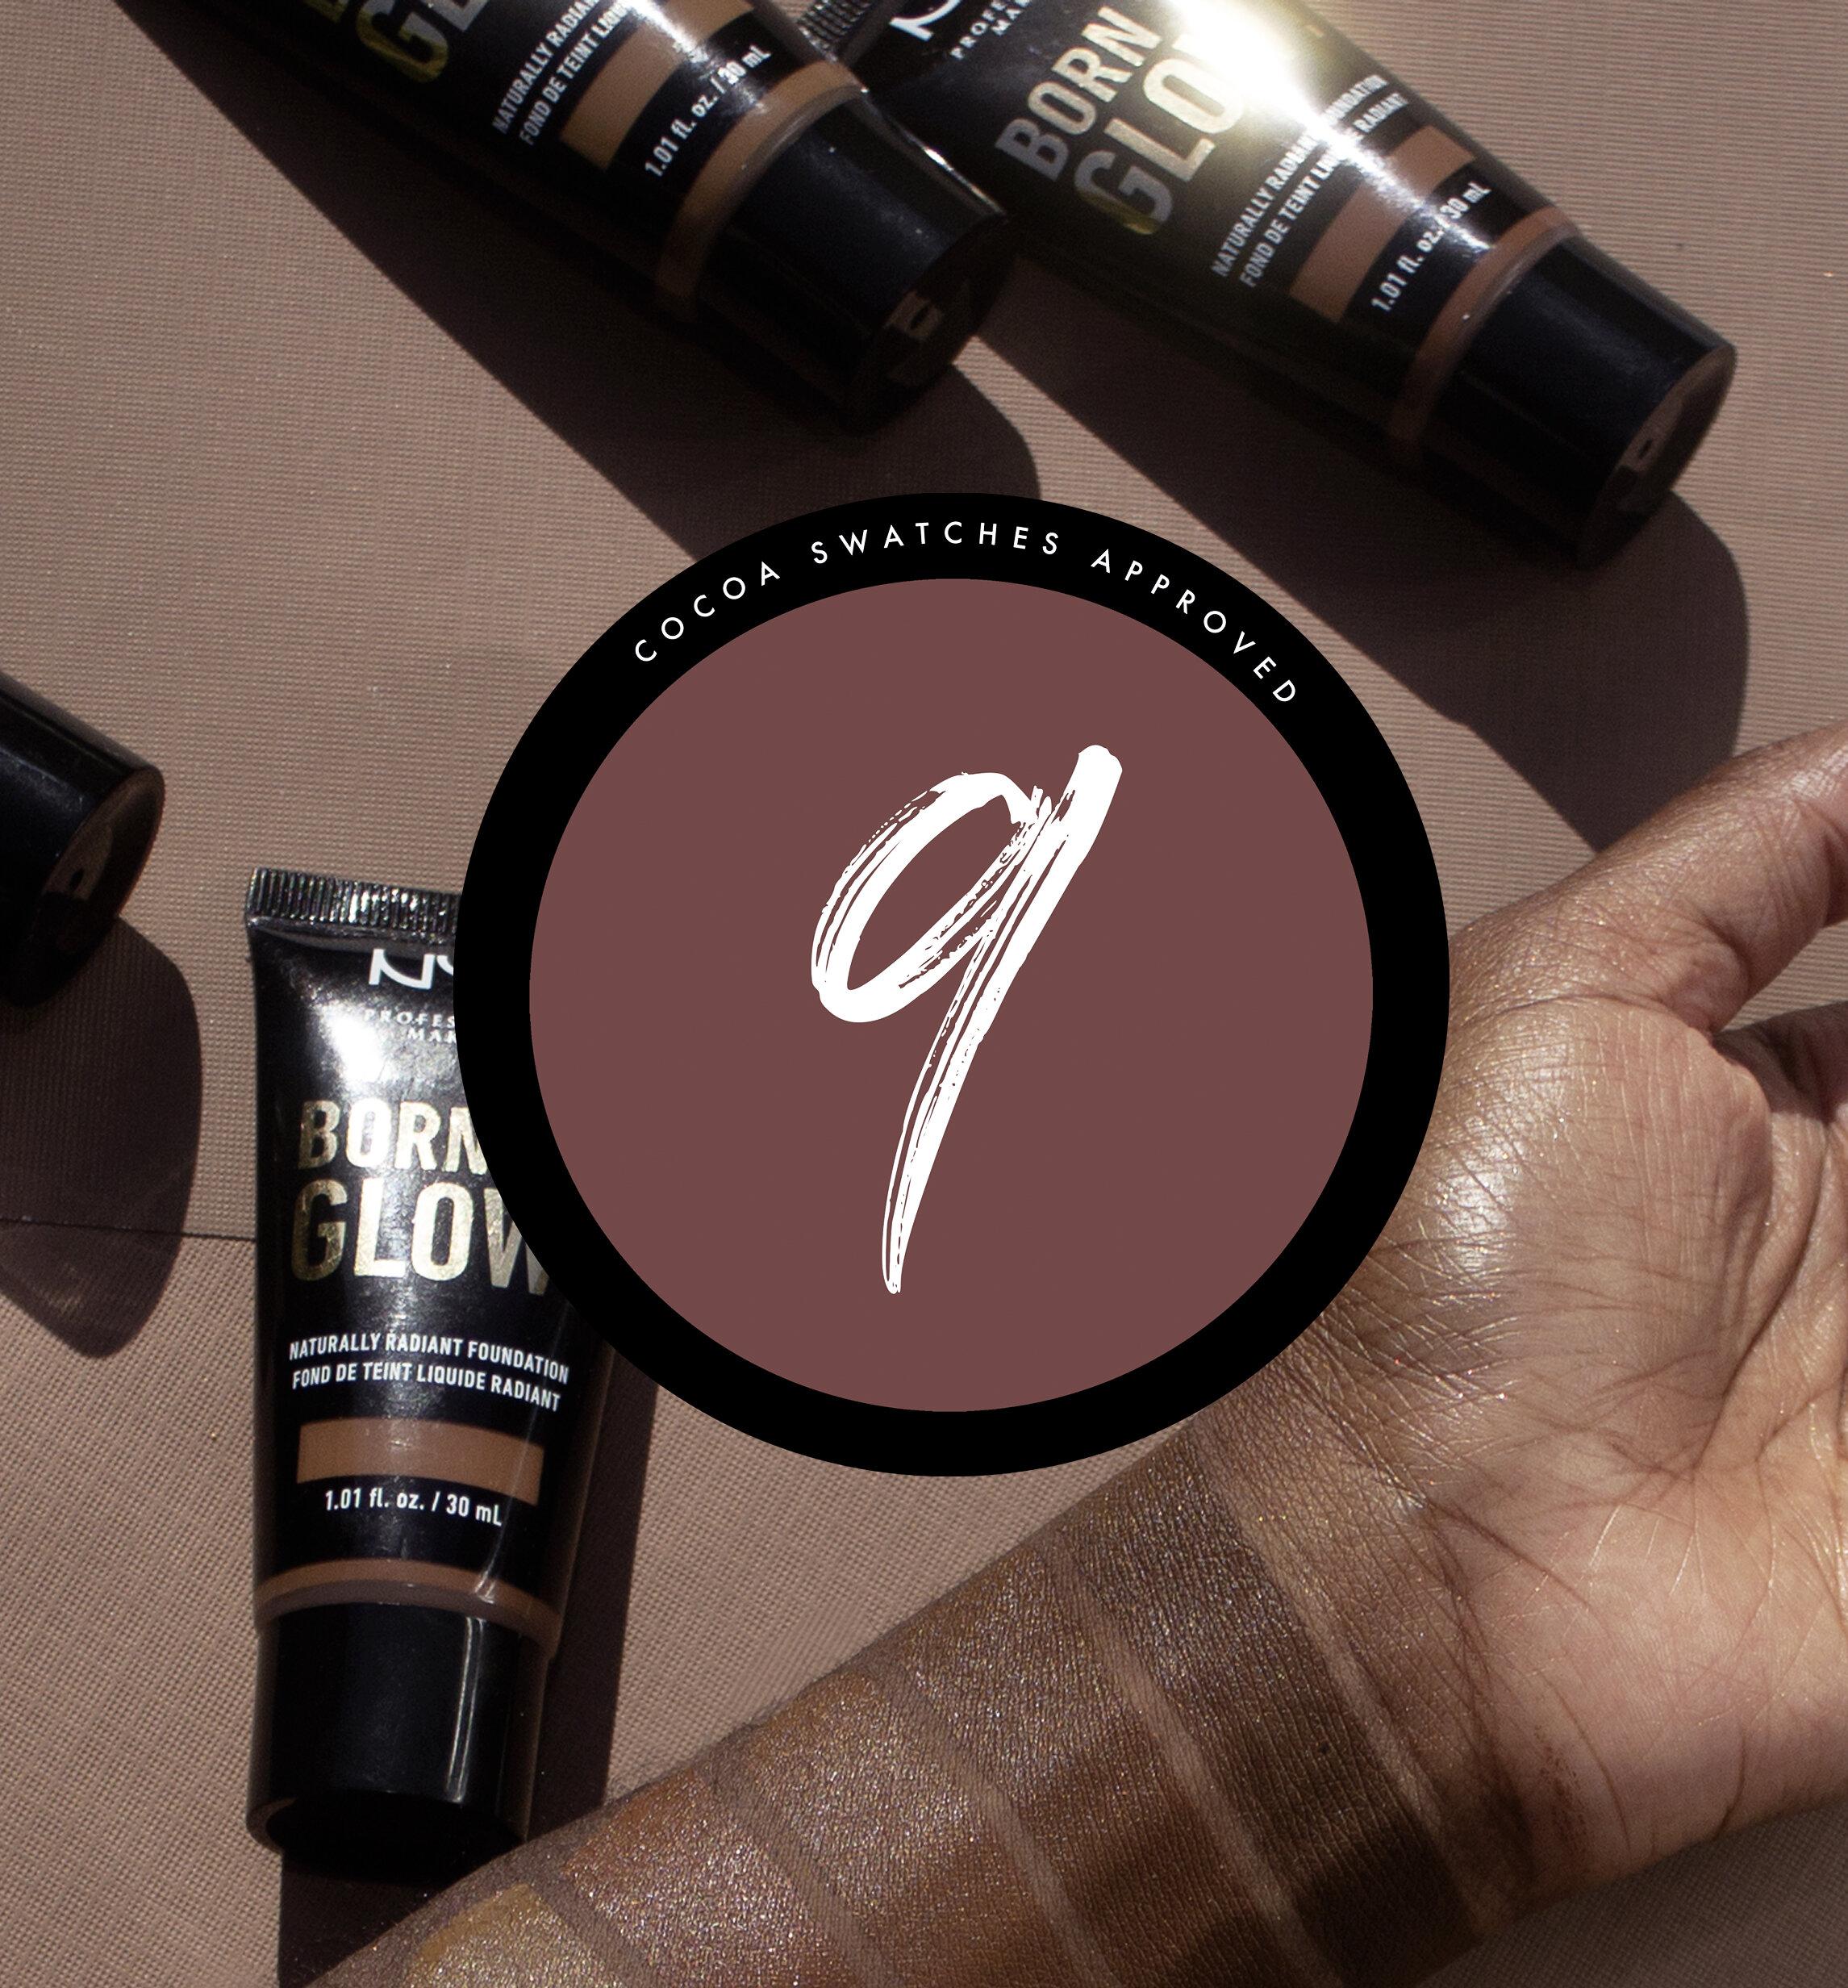 Born To Glow Foundation Nyx Cosmetics Cocoa Swatches